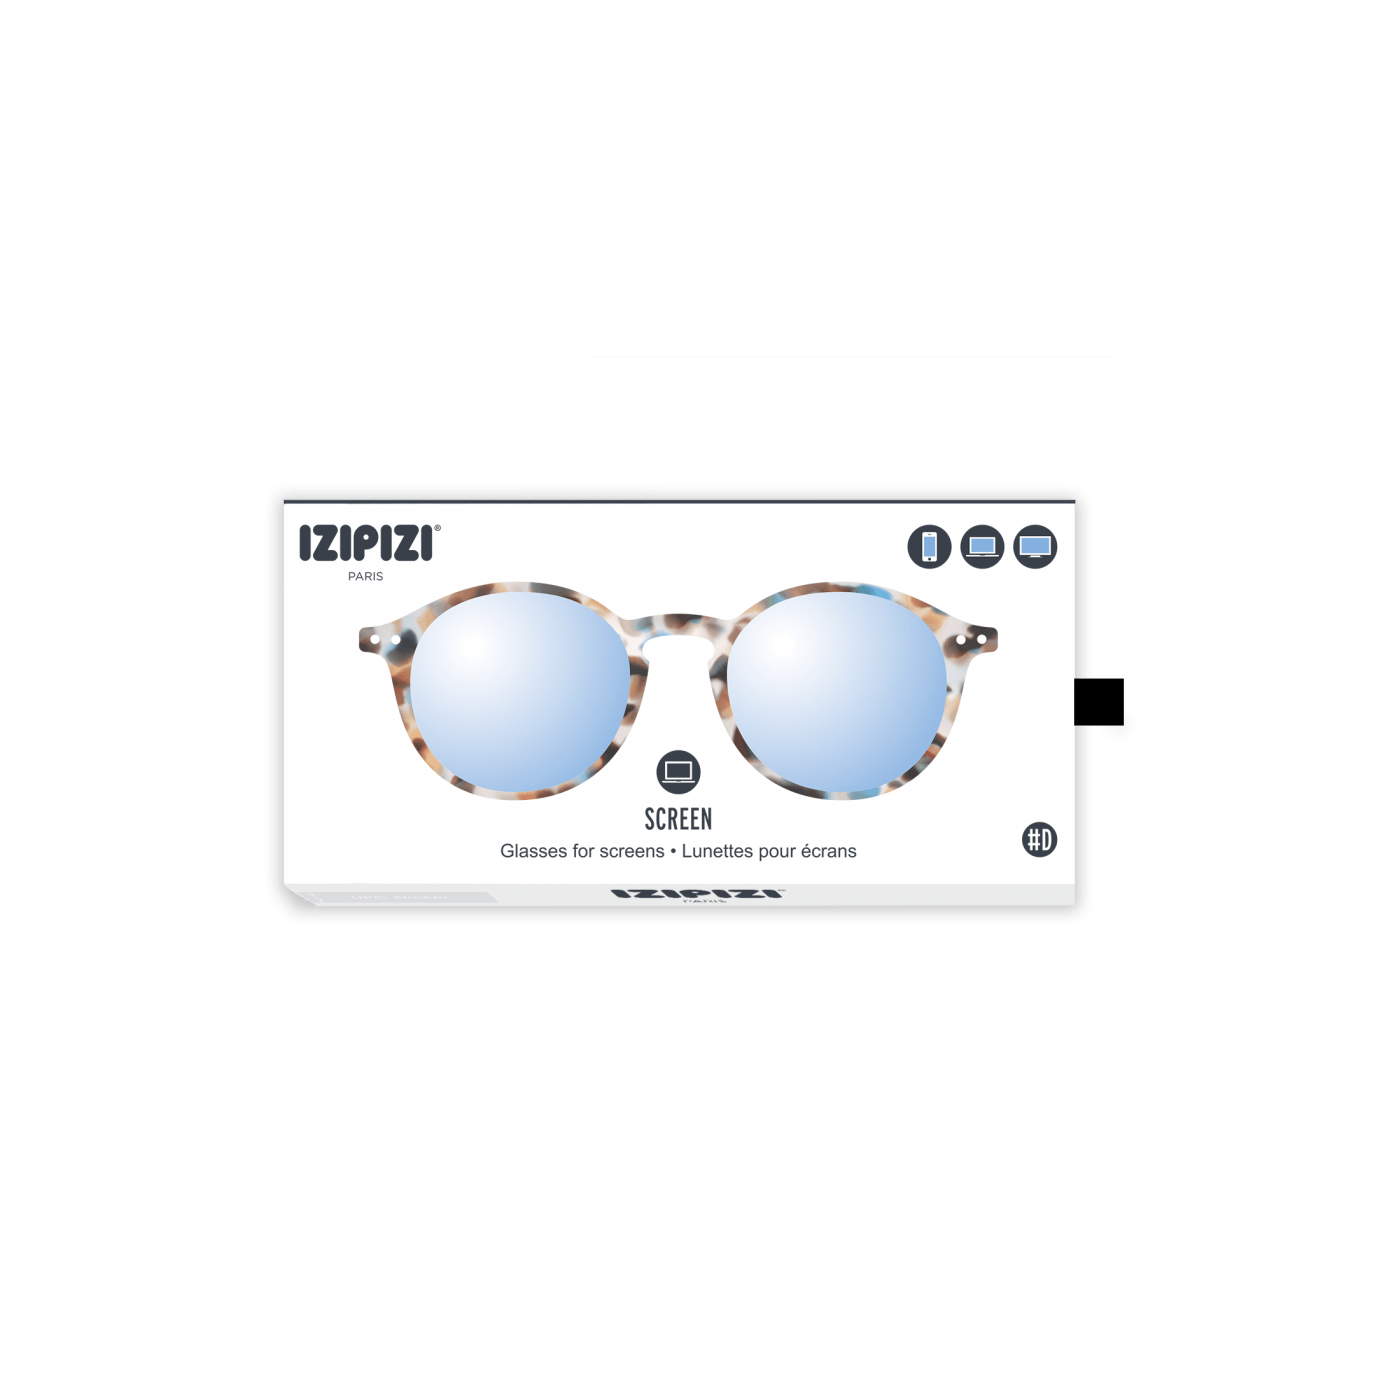 Izipizi #D Screen Protection Glasses in Blue Tortoise